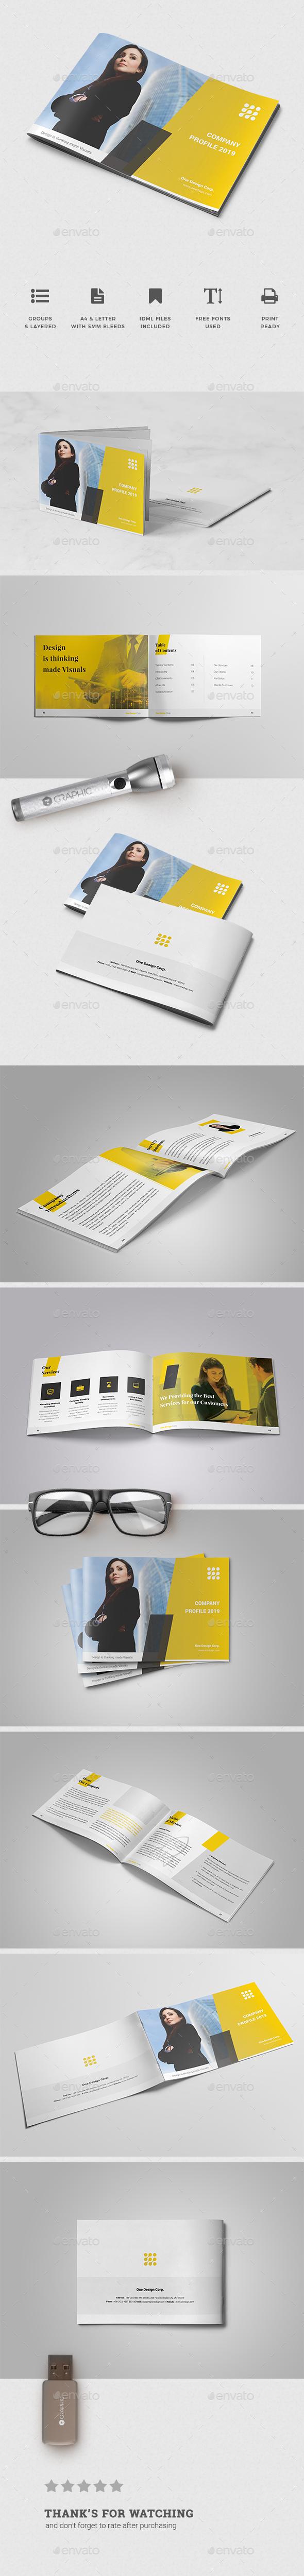 Corporate Brochure Template Vol. 46 - Brochures Print Templates